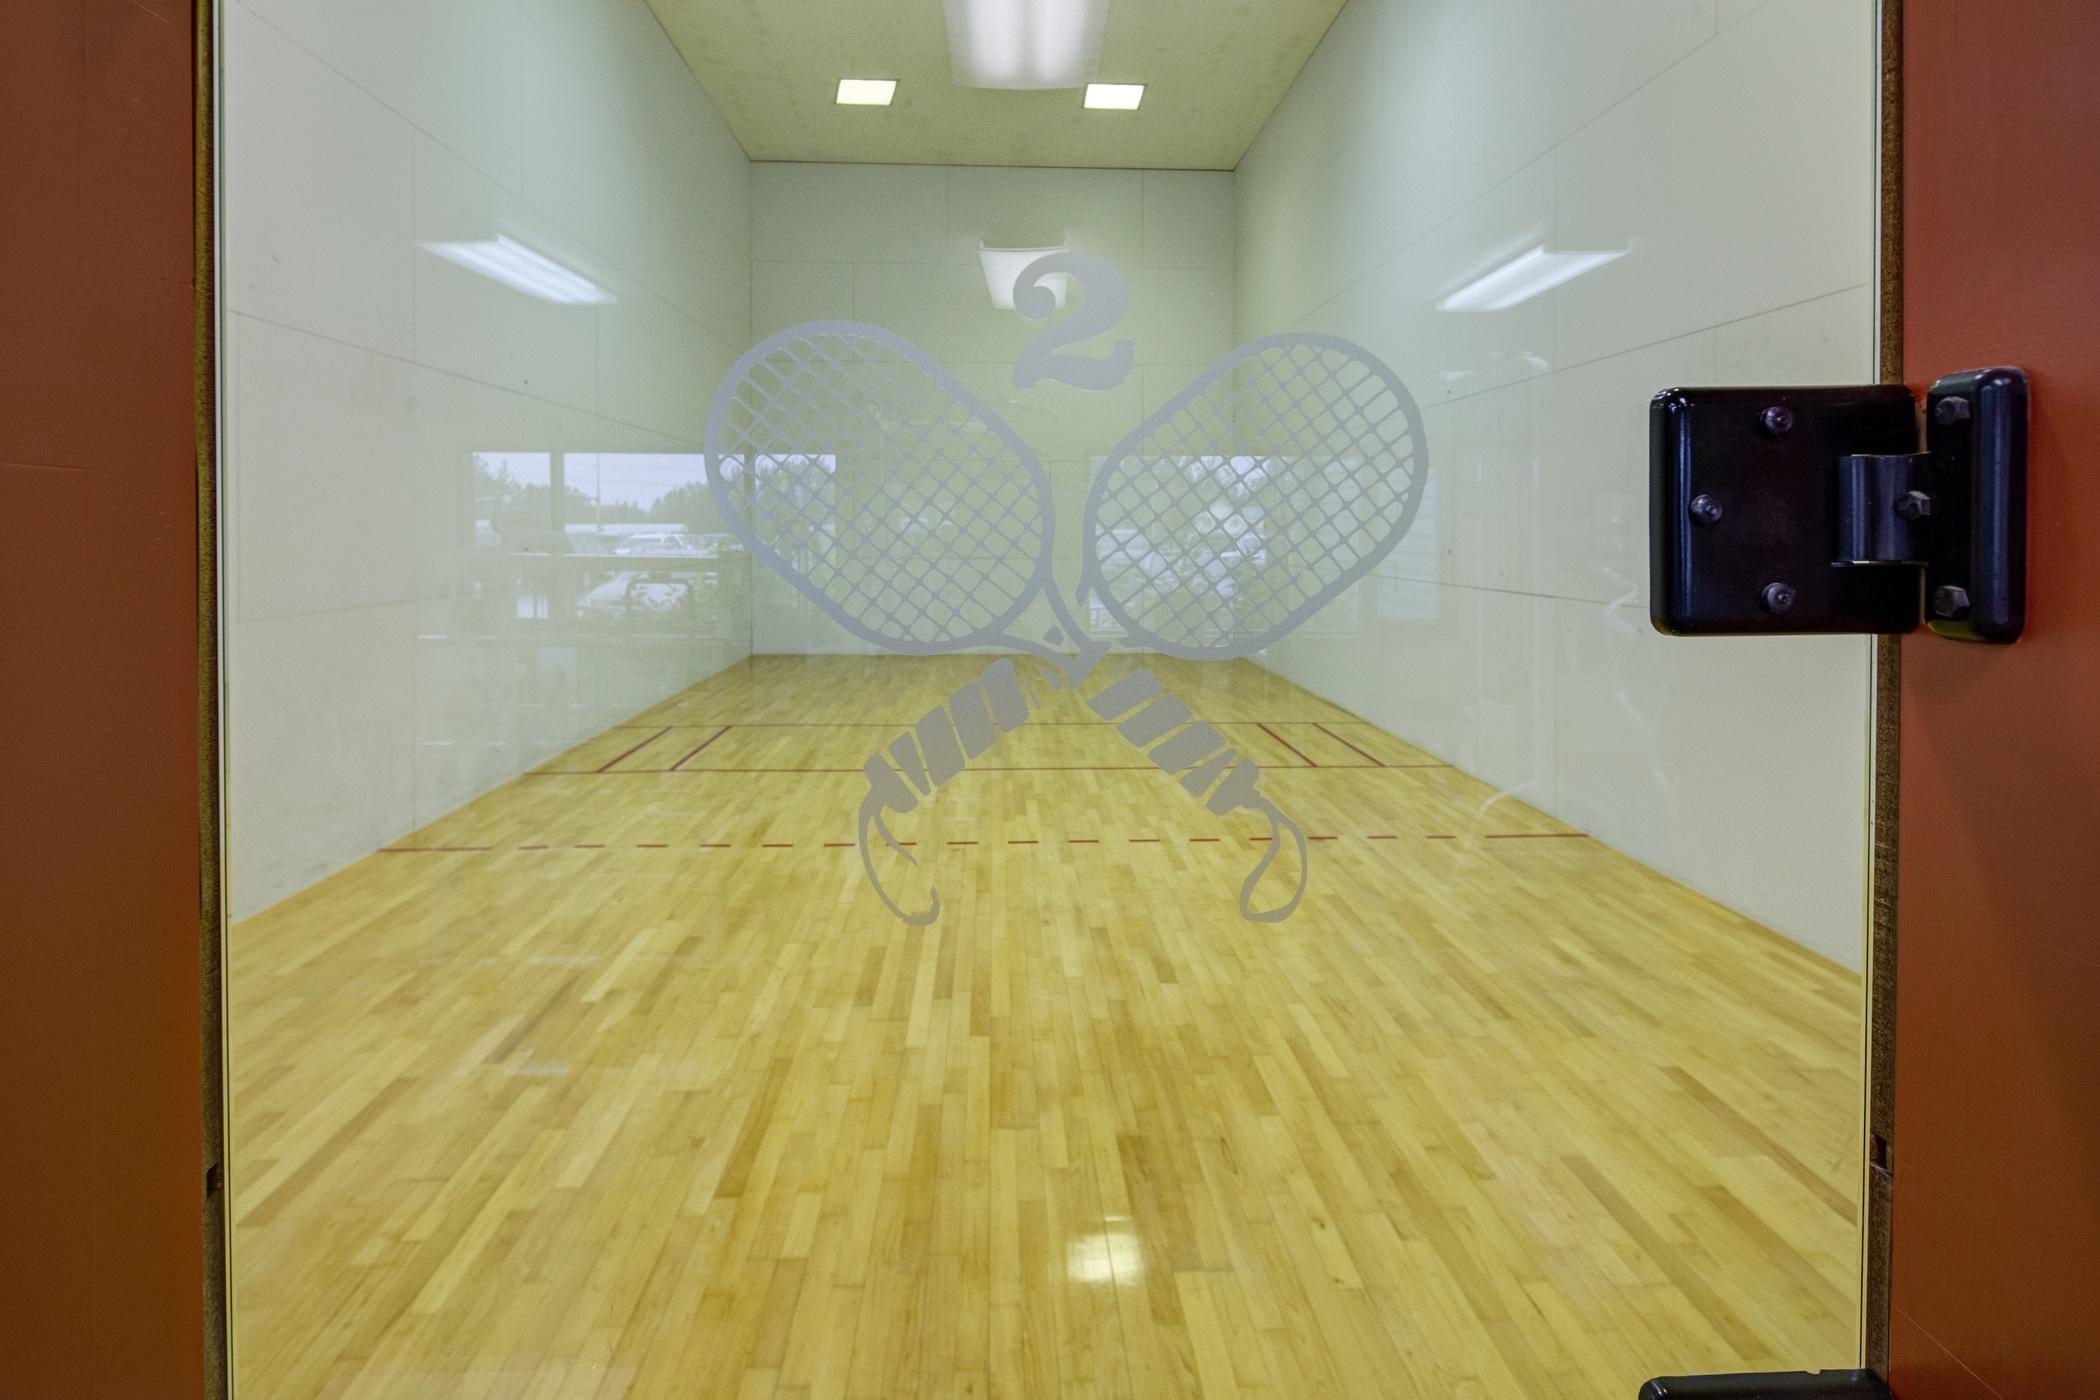 The Alaska Club Racquetball